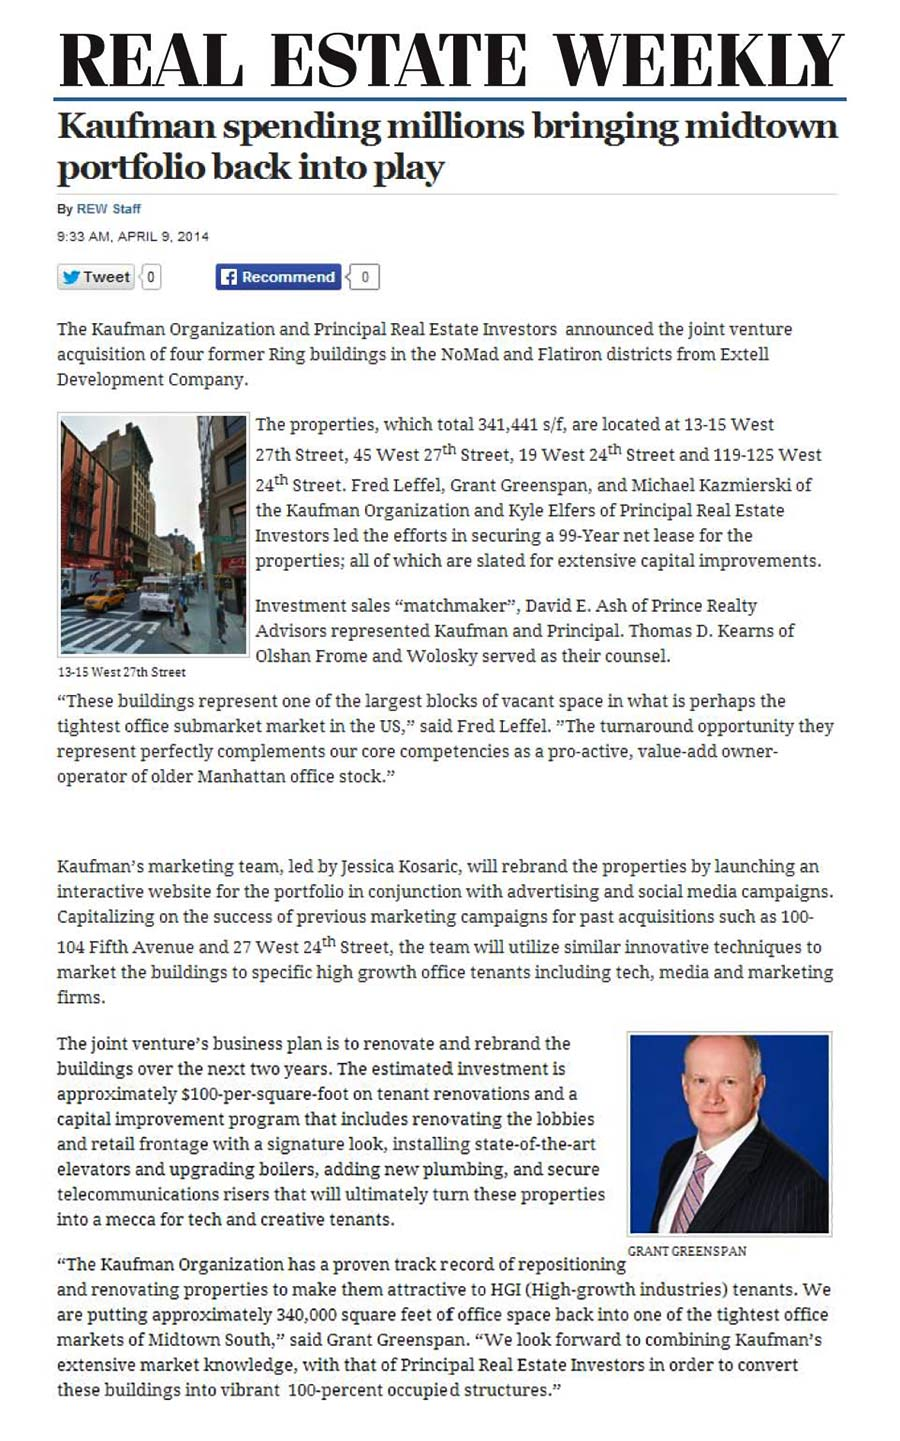 Real-Estate-Weekly-(Online),-Kaufman-spending-millions-bringing-midtown-portfolio-back-into-play,-4.9.2014